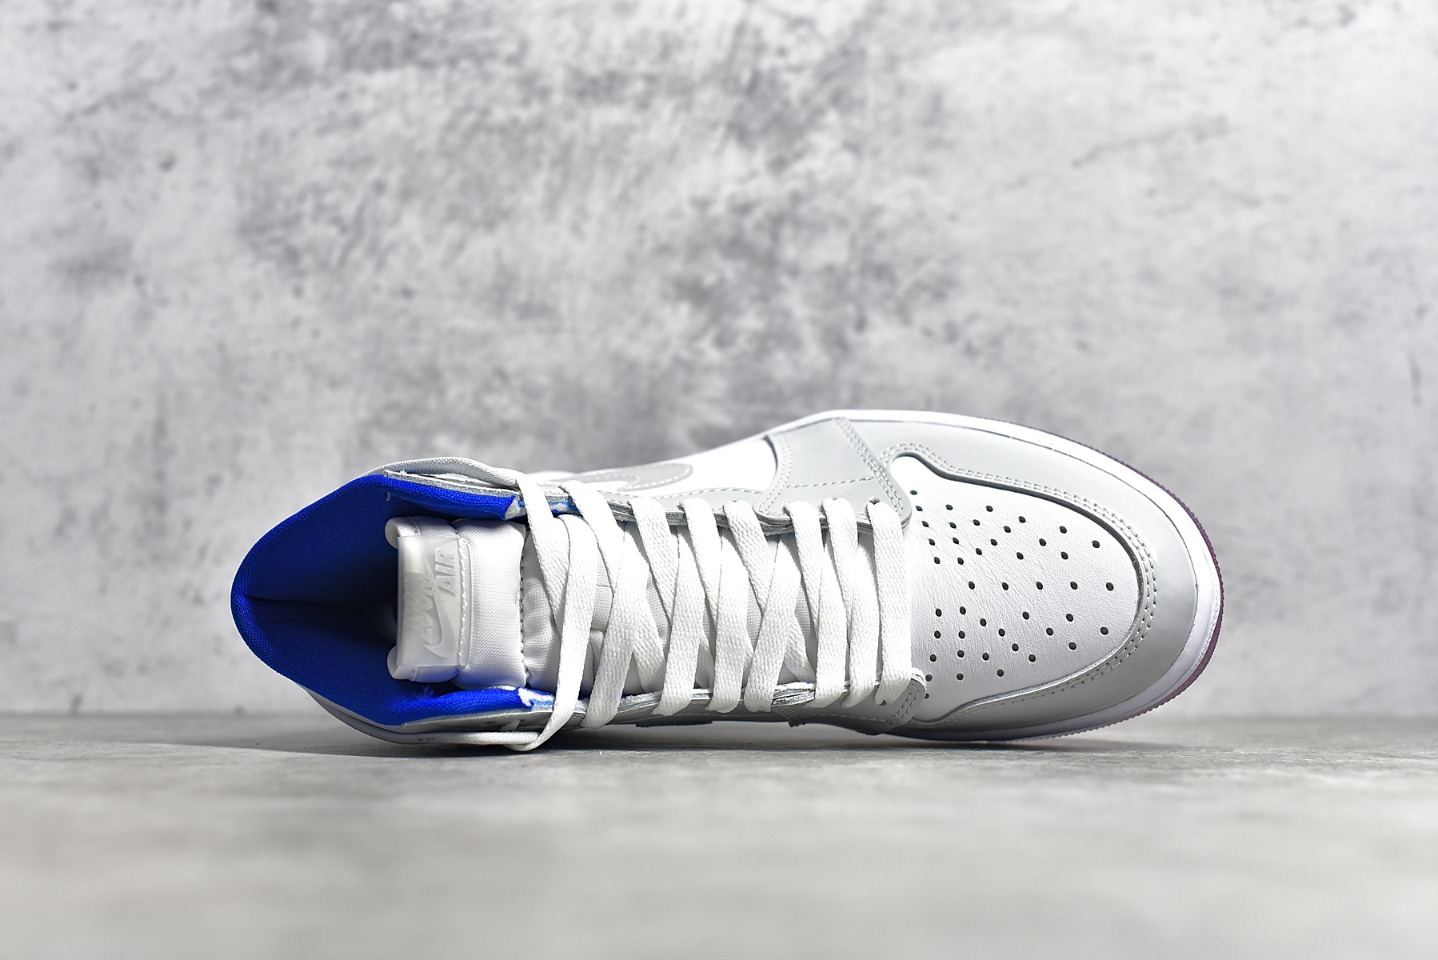 AJ1小迪奥高帮性价比版本 Air Jordan 1 Zoom Racer Blue AJ1迪奥联名 货号:CK6637-104-潮流者之家